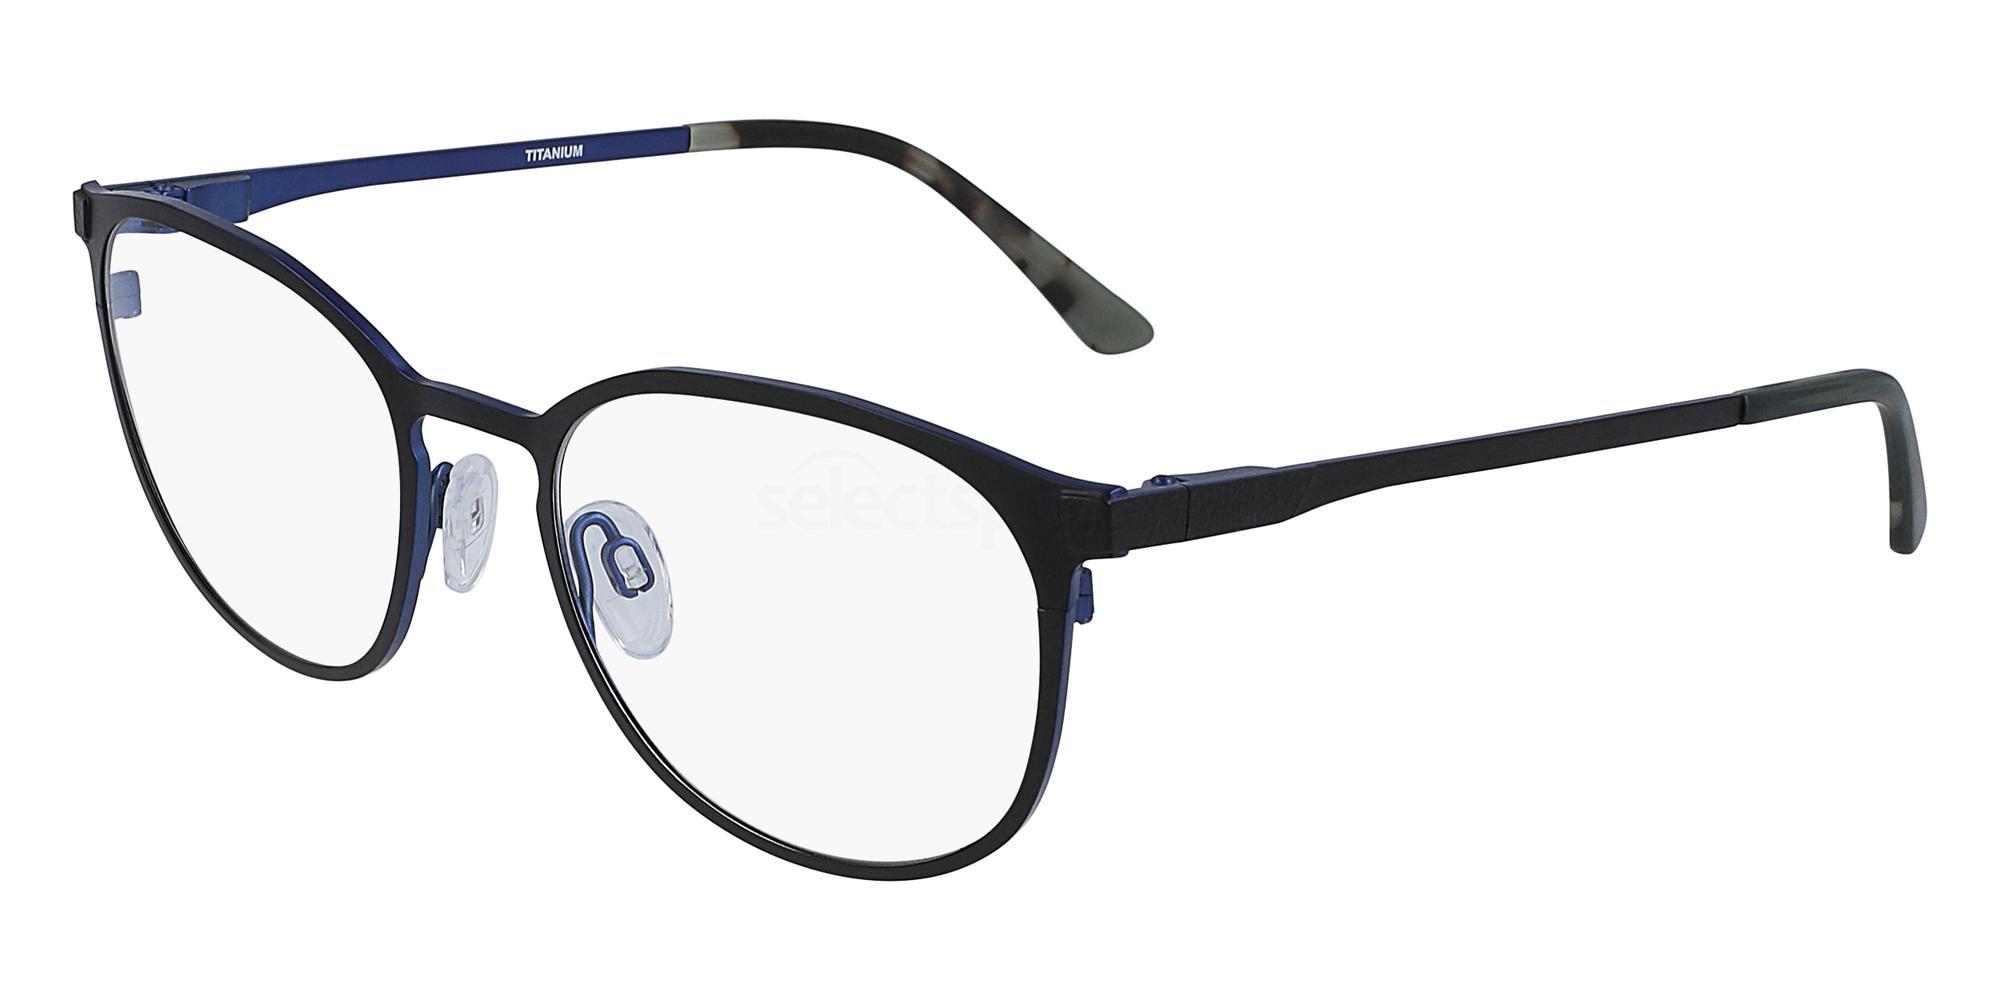 001 SK2844 FOKUS Glasses, Skaga